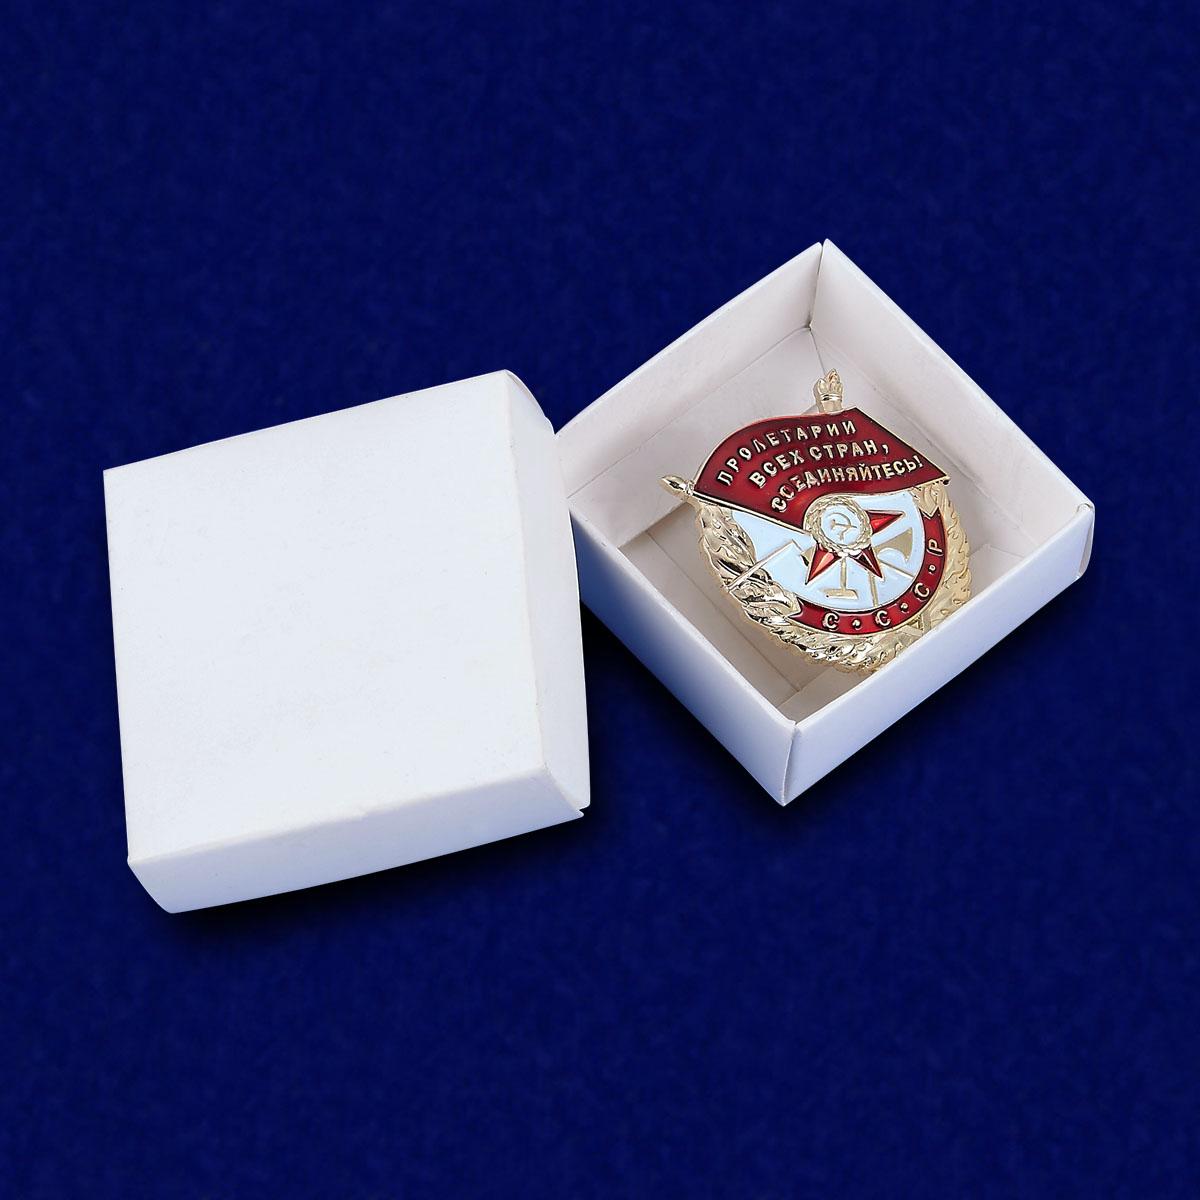 Орден Красного Знамени в Военпро в виде муляжа